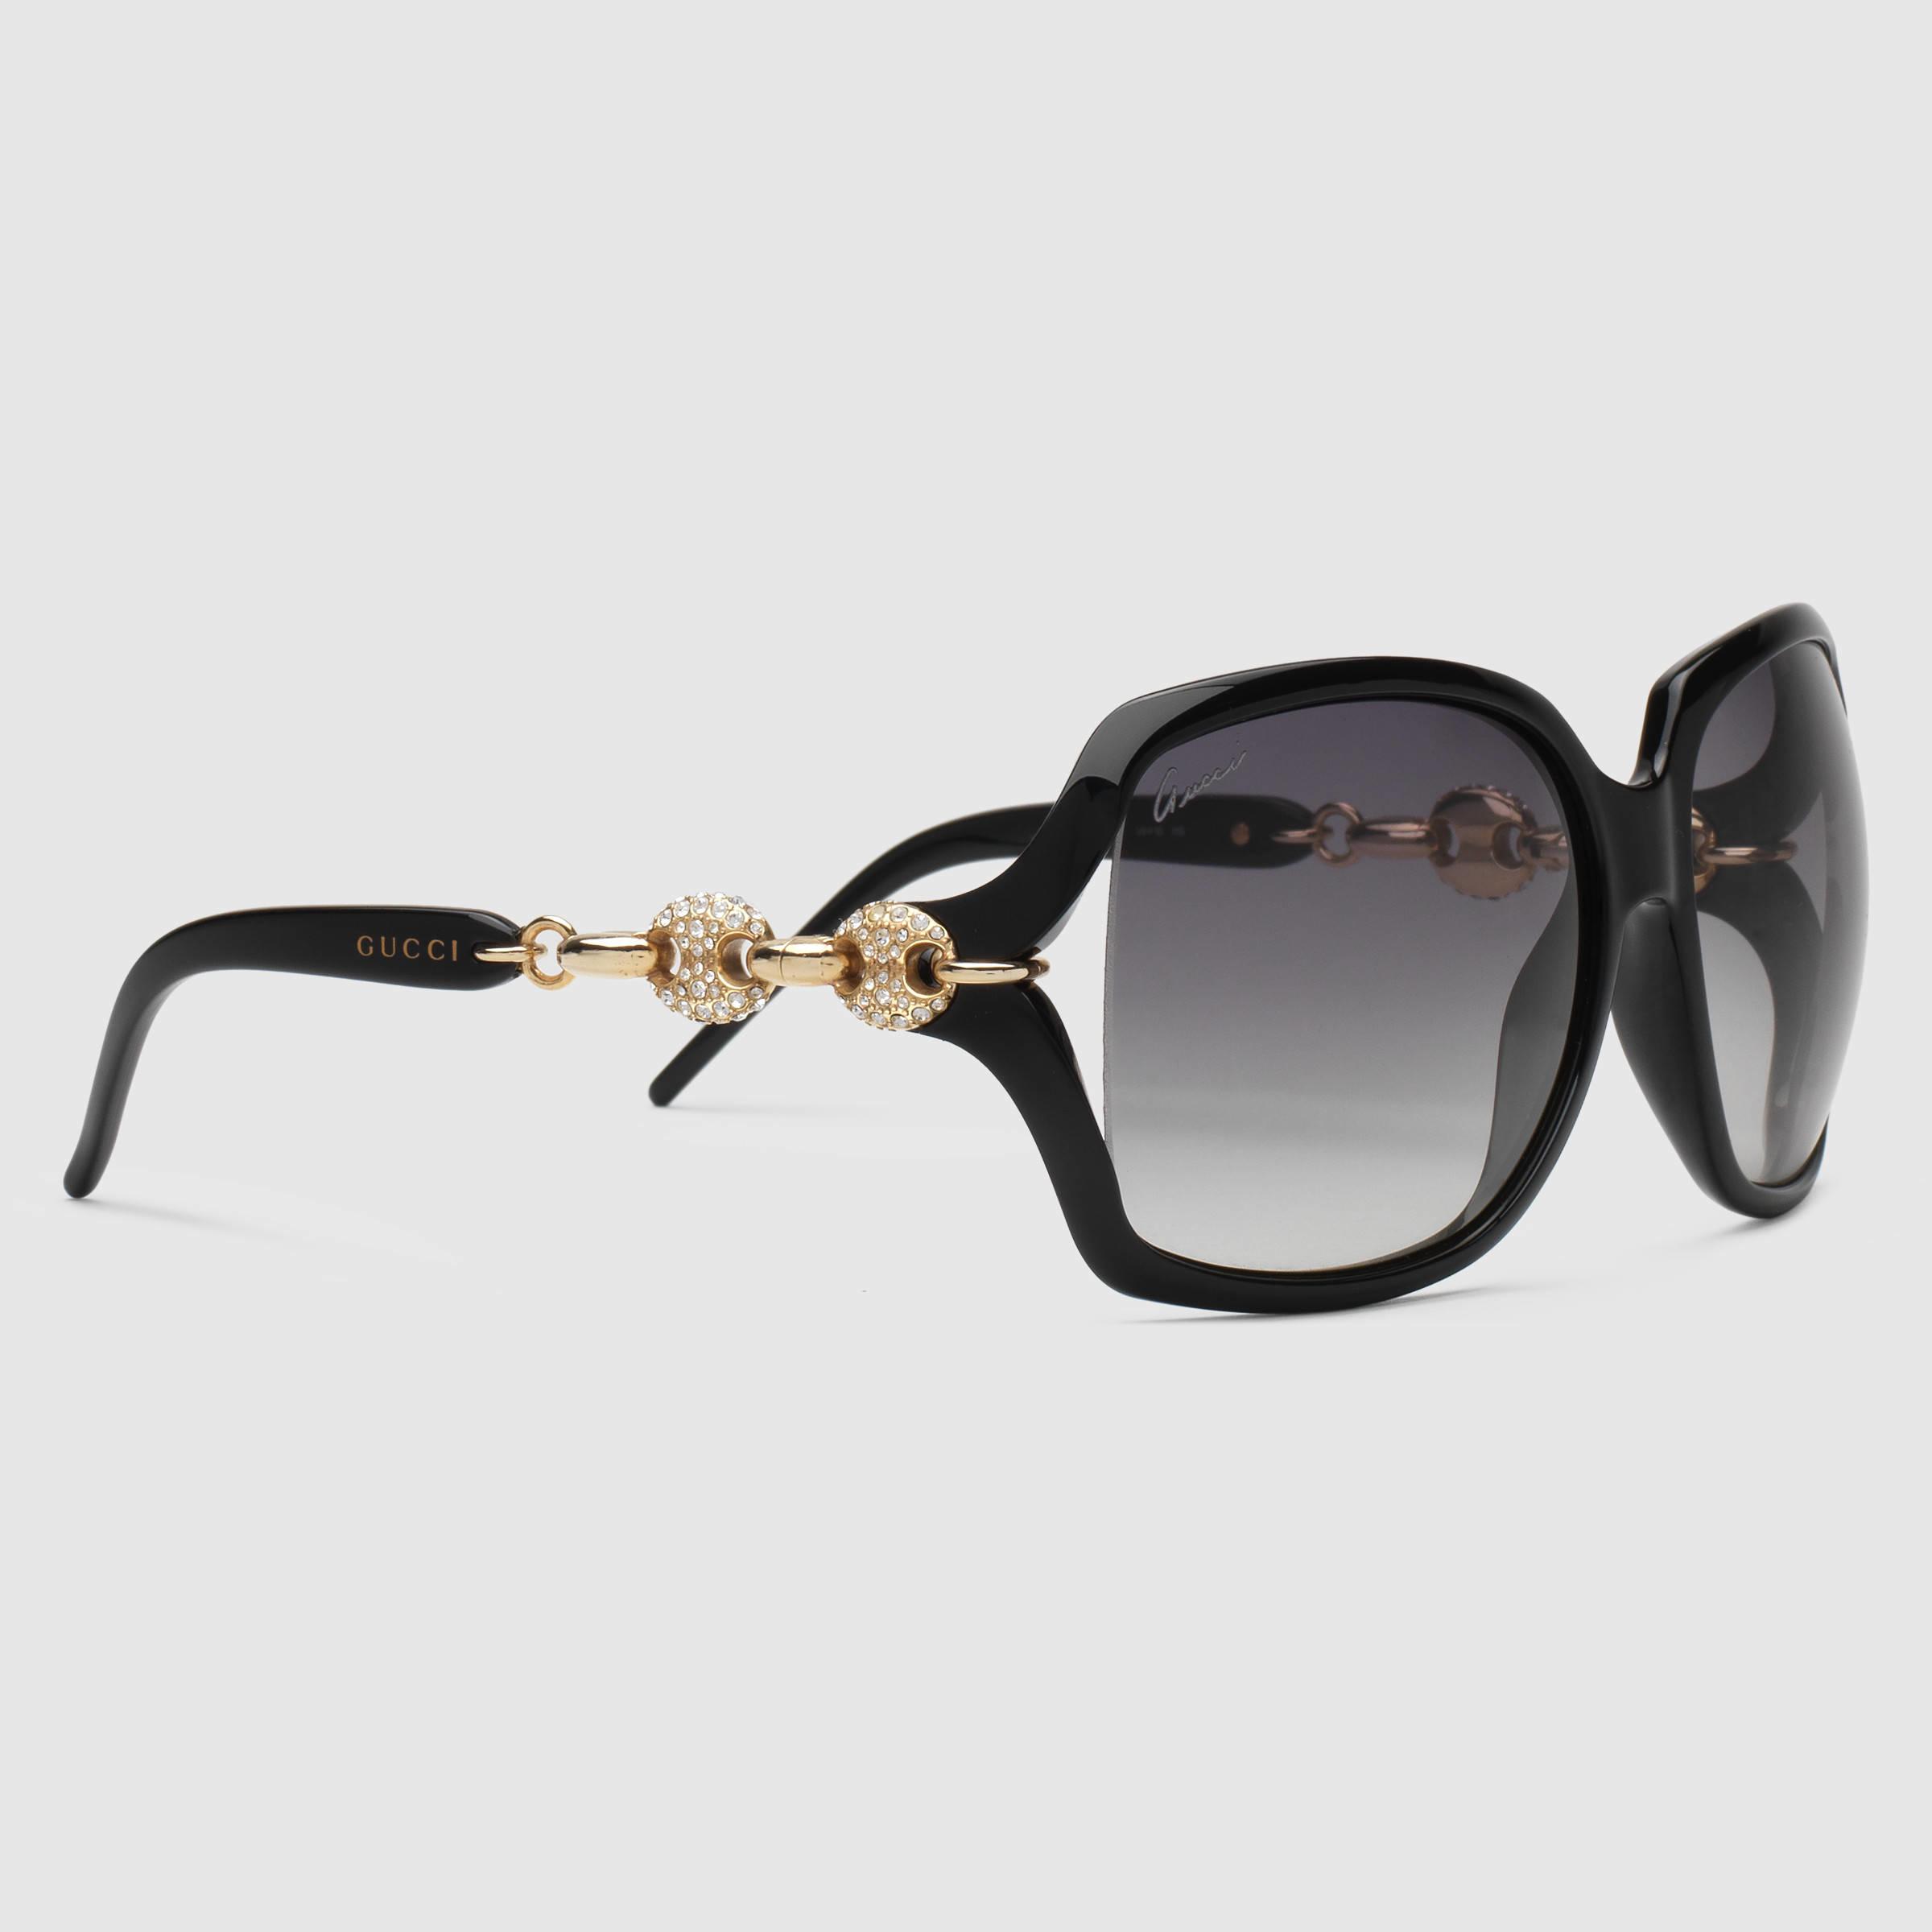 c2f7330eed0 Gucci Crystal Marina Chain Sunglasses in Black - Lyst